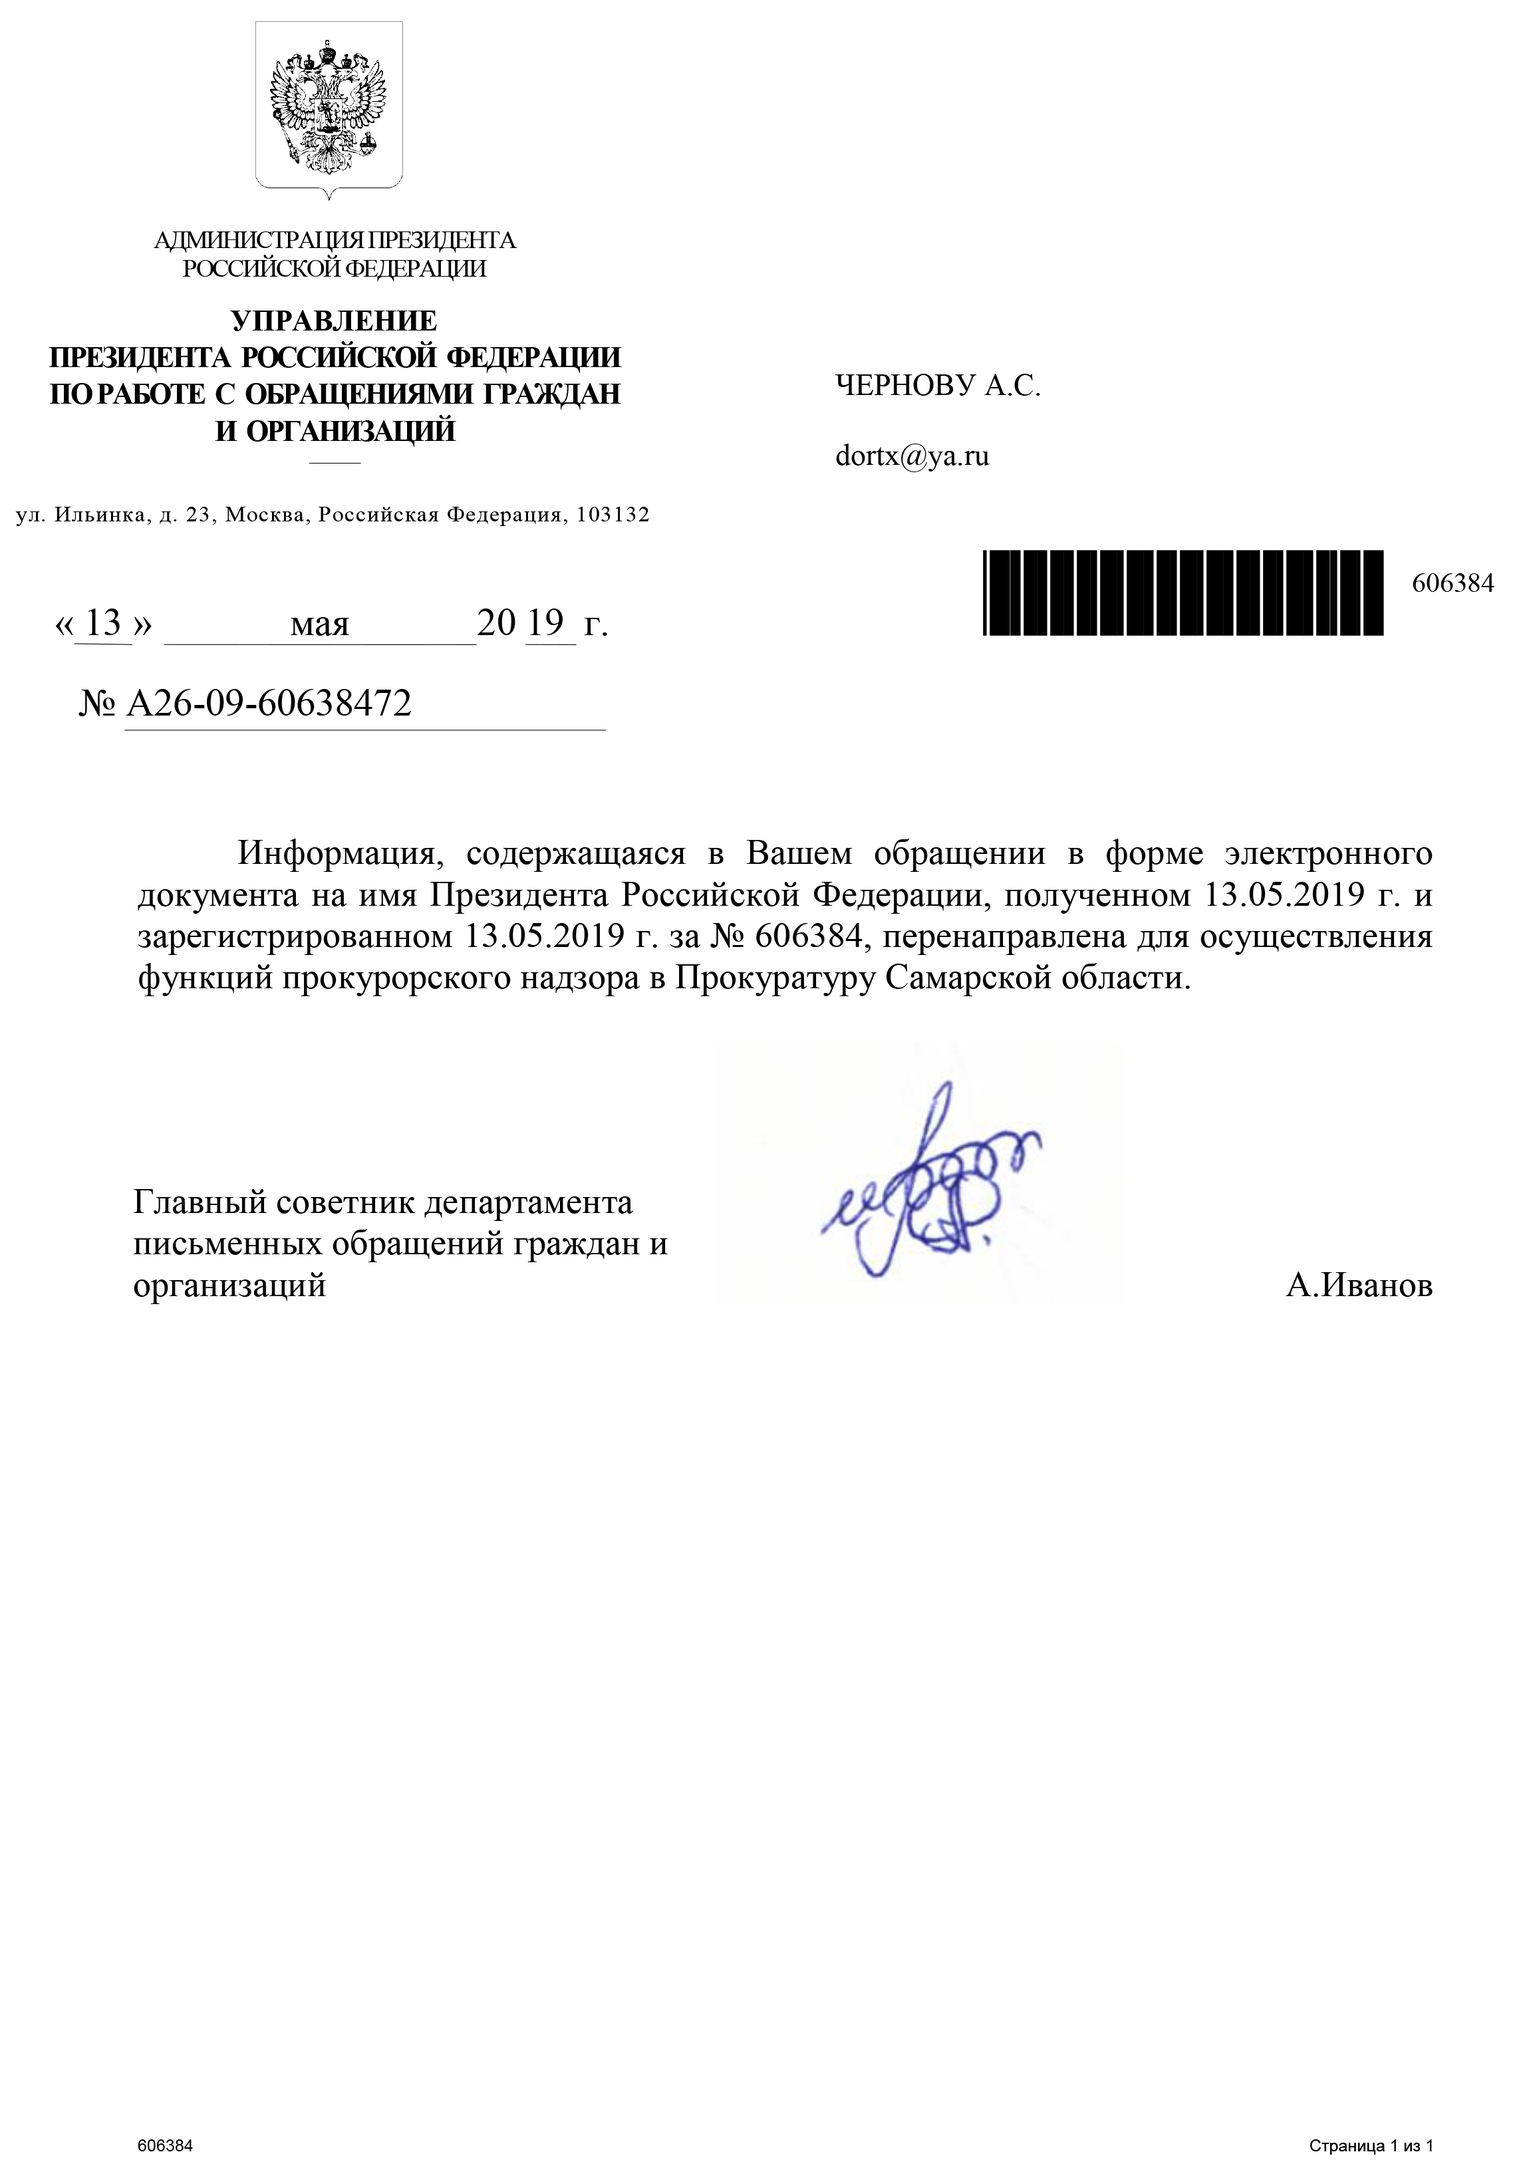 Прокуратура Самарской области о мусорной реформе